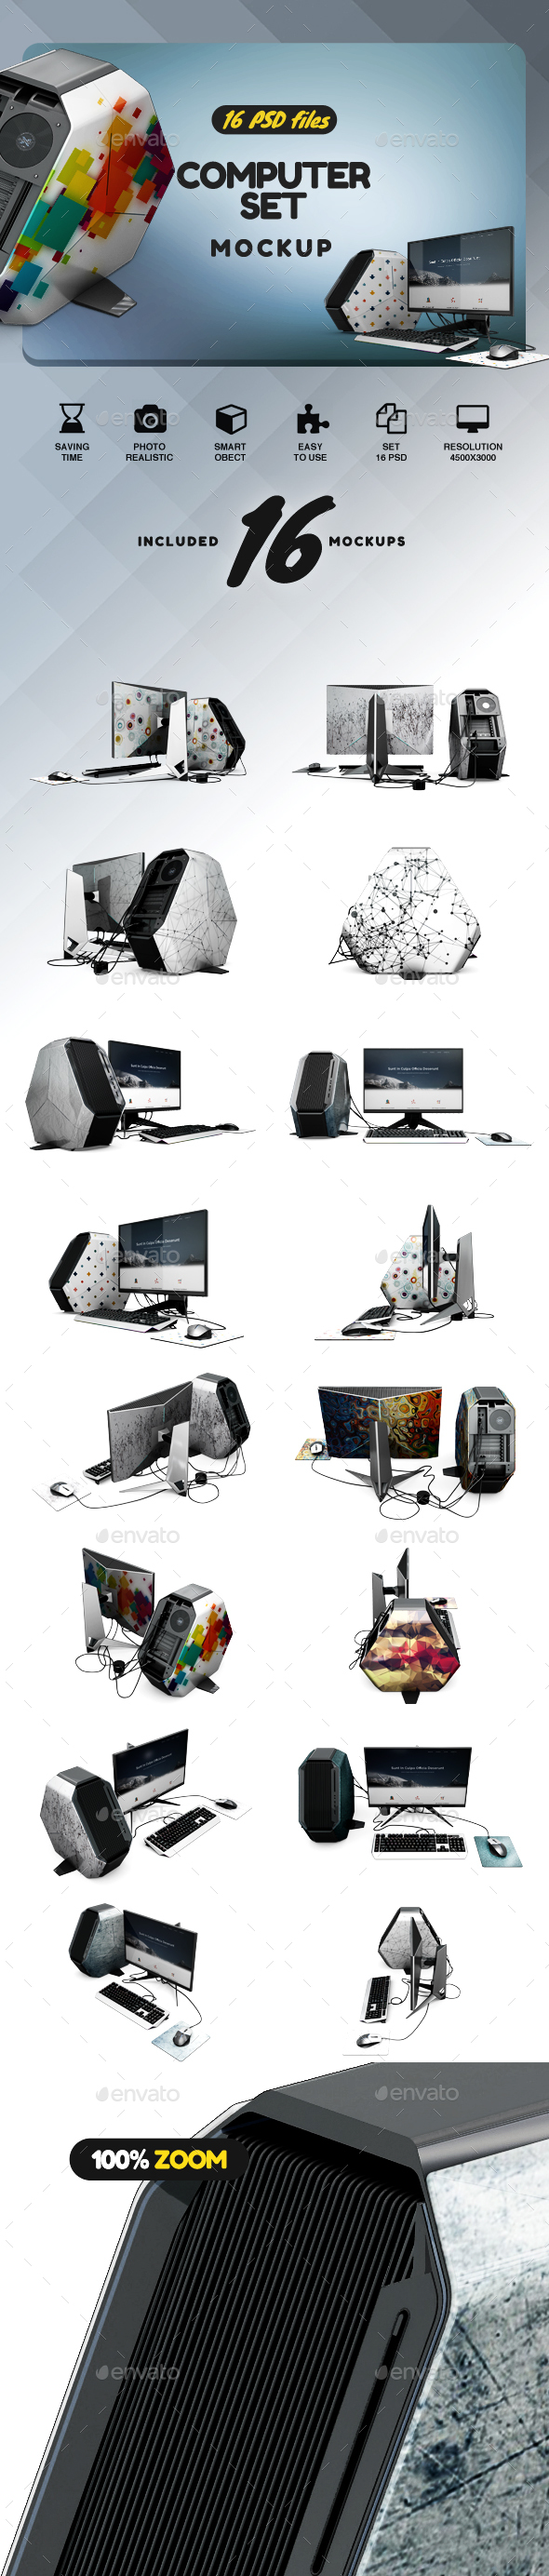 Computer Set App & Skin Mockup - Product Mock-Ups Graphics